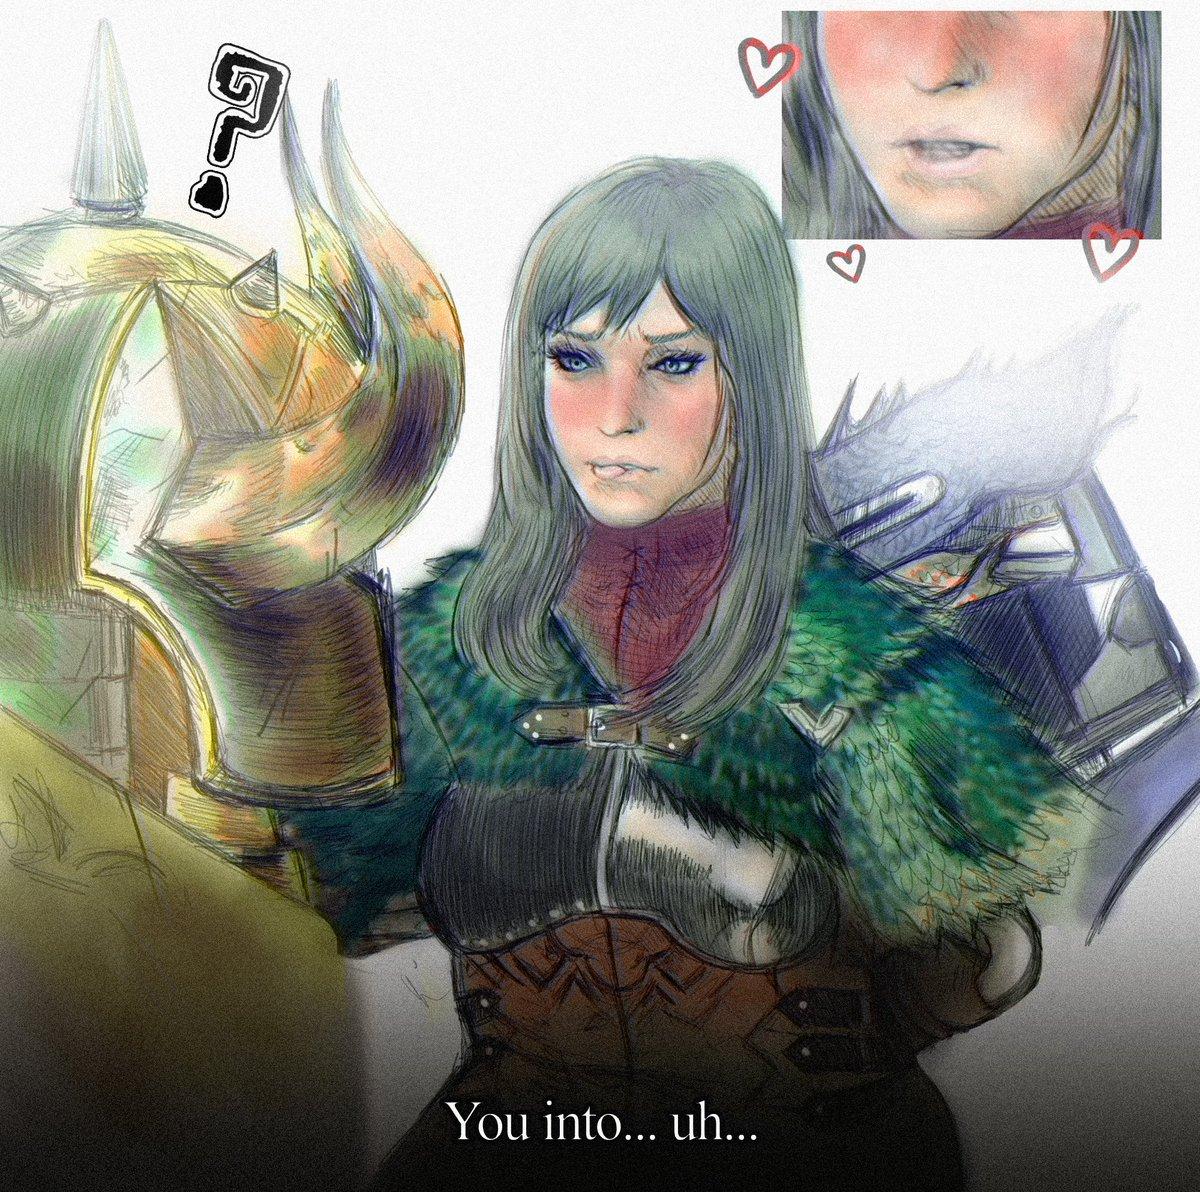 Mirin' , (MHW Iceborne, May 2020)  #digitalart #illustration #mhw #iceborne #hbg #lbg #bowgun #bowgunner #heavybowgun #heavybowgunner #stickyammo #mirin #pretty #prettygirls #pukeipukei #fanart #videogames #comicart #mangaart #armor #digitalpaintingpic.twitter.com/YkwLnpAozp